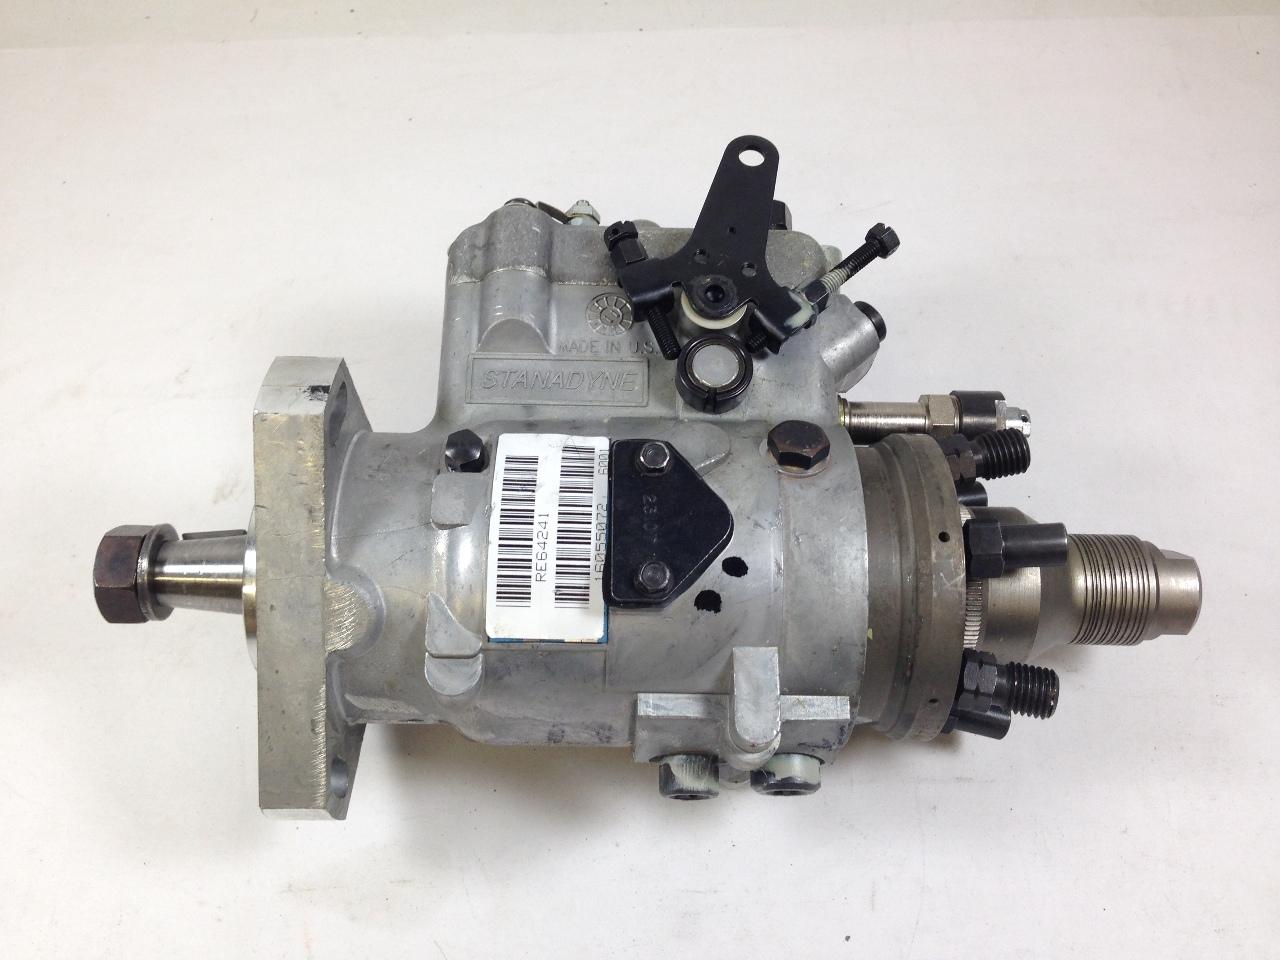 John Deere Injection Pump Troubleshooting >> John Deere RE64241 Fuel Injection Pump (s#2-4) | eBay